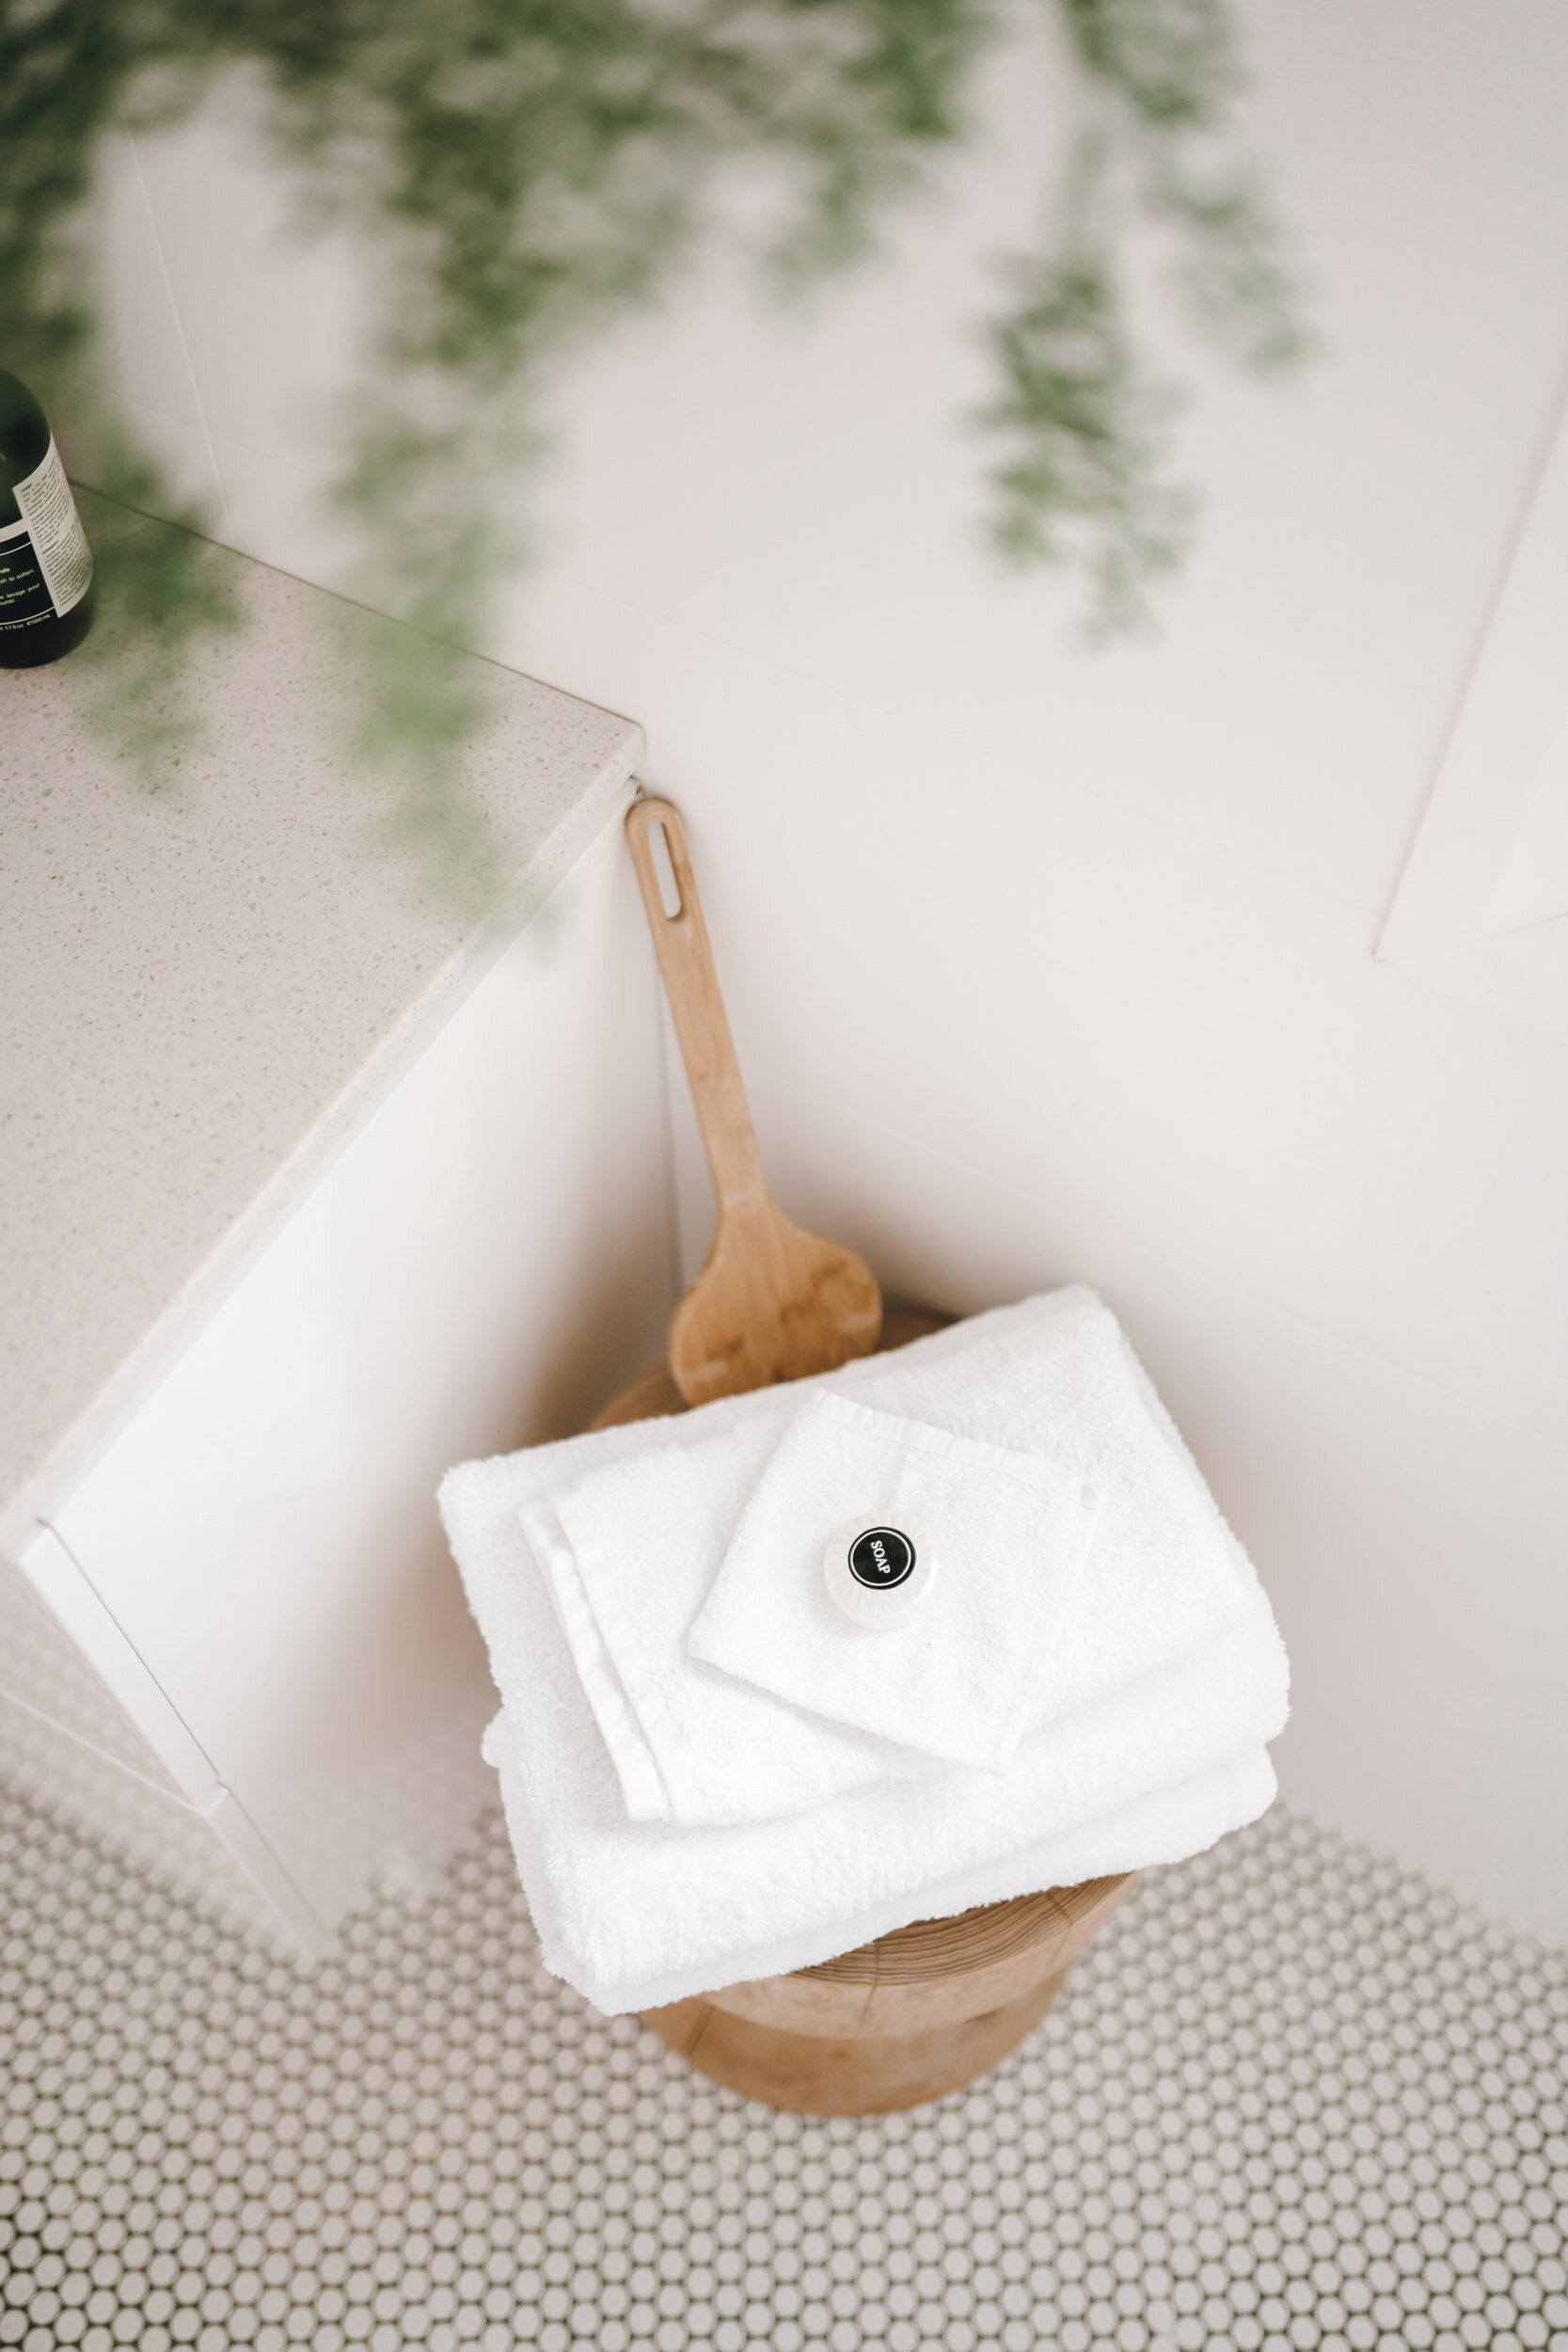 keira-mason-flourish-on-bull-street-bathroom-towels.jpg